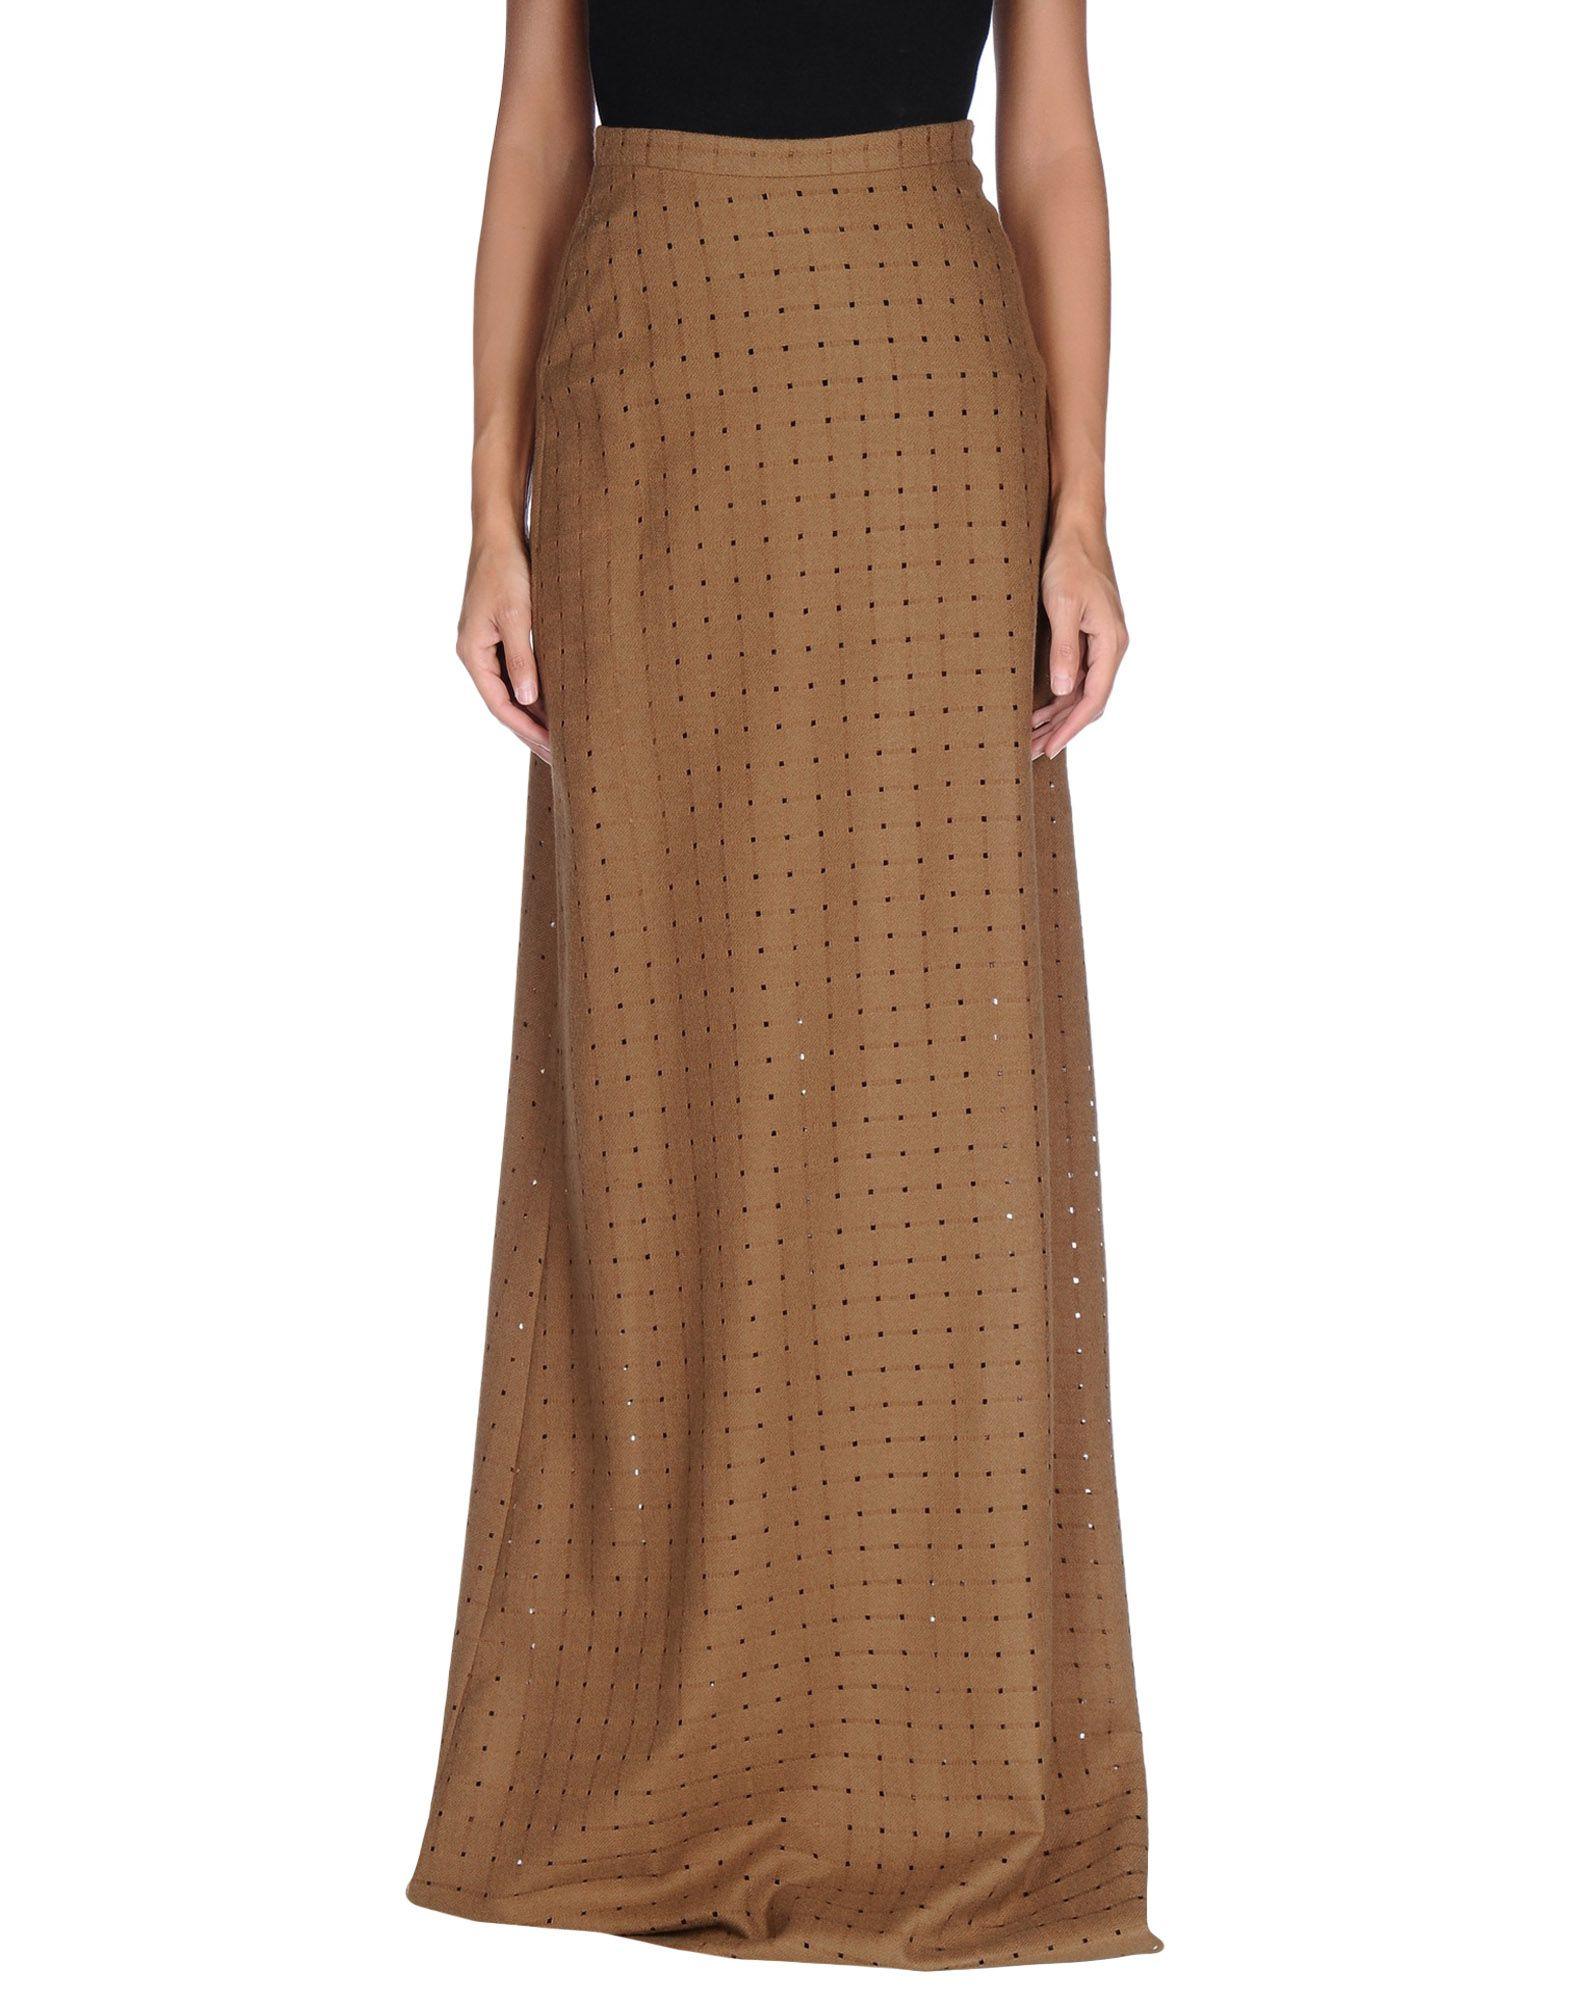 Maurizio pecoraro long skirt in brown lyst for Maurizio pecoraro shop on line